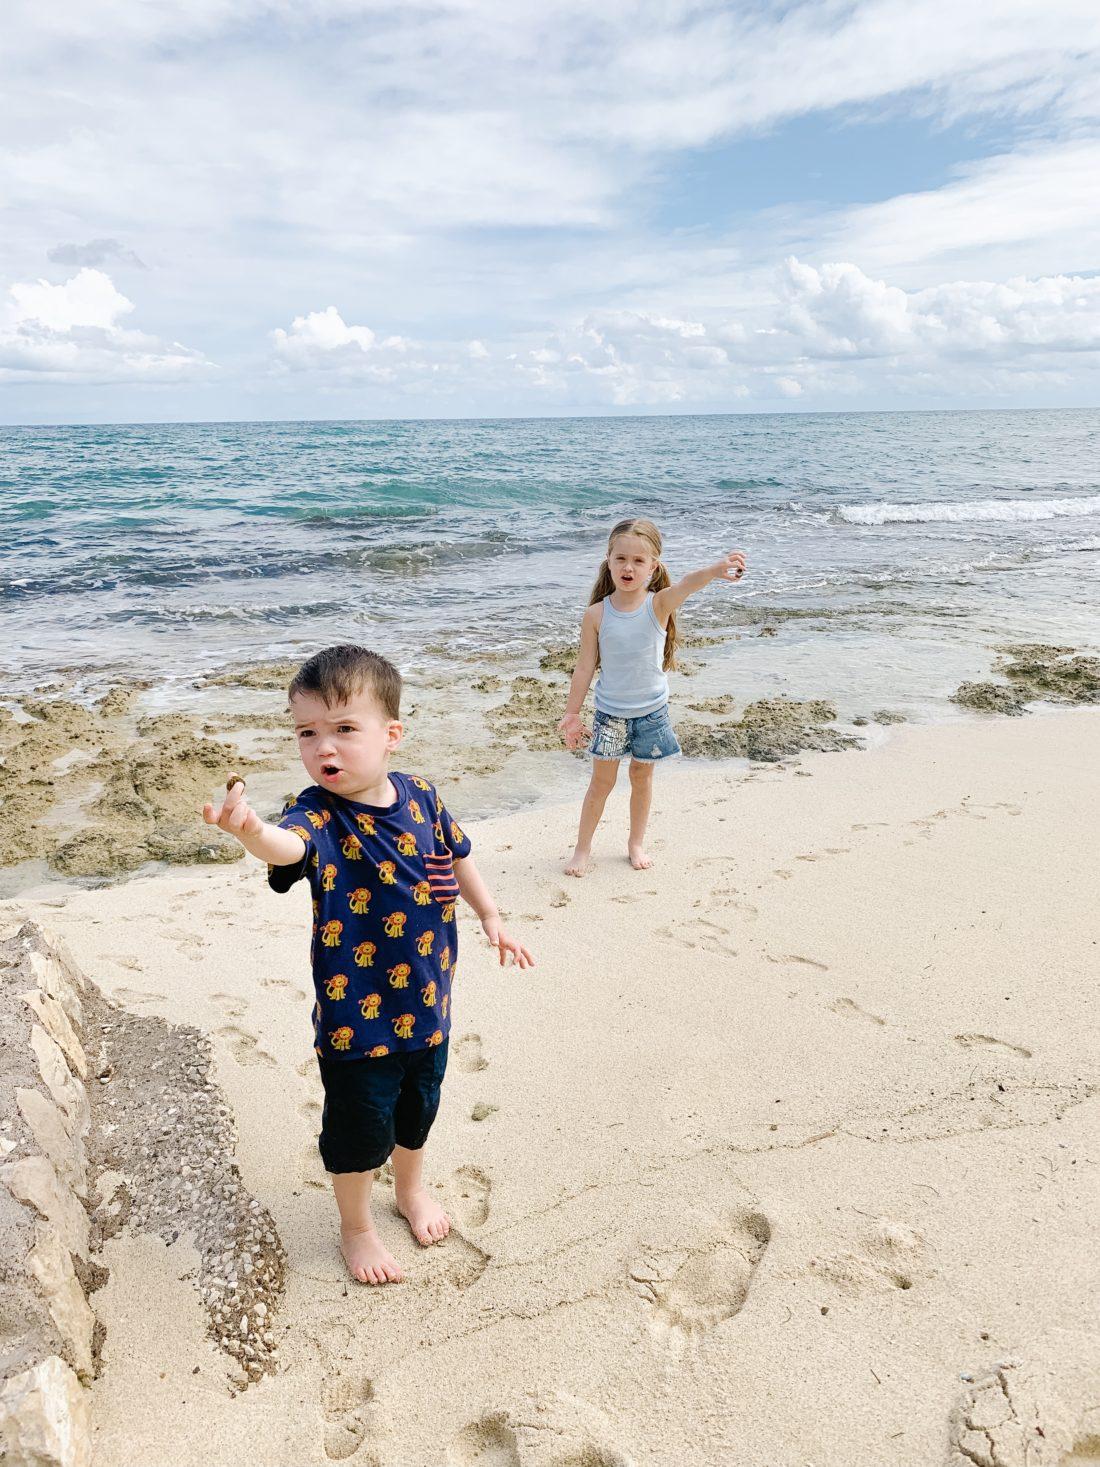 Eva Amurri Martino's kids Marlowe and Major enjoy a family trip to Jamaica